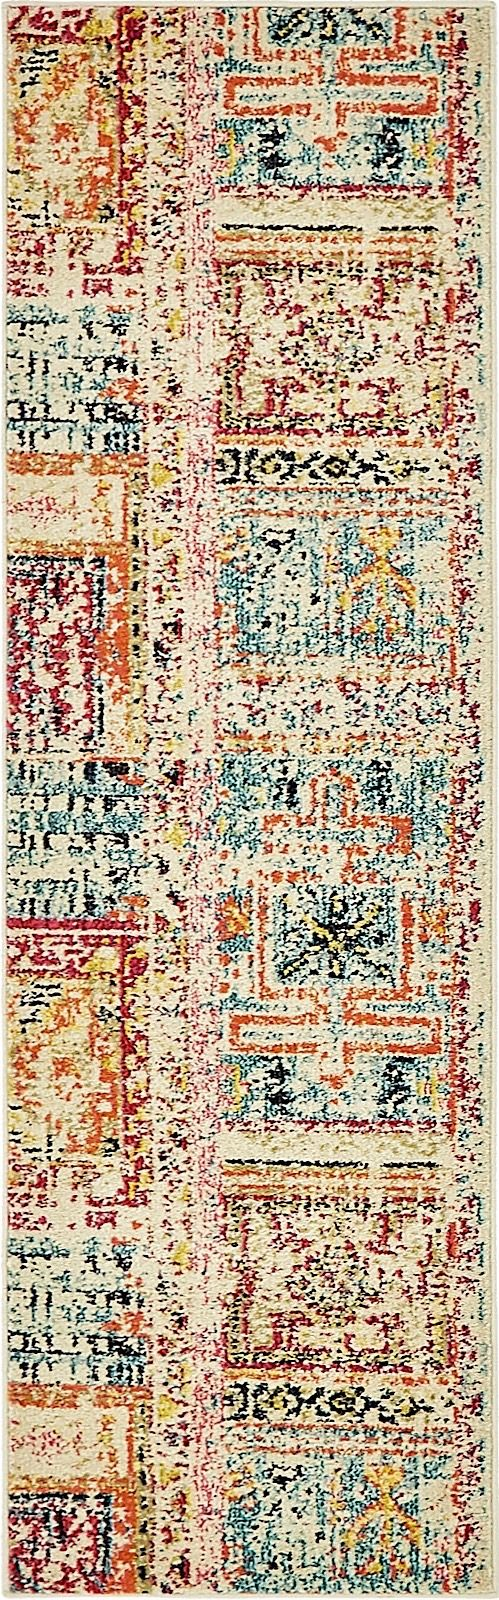 santa cruz transitional area rug collection